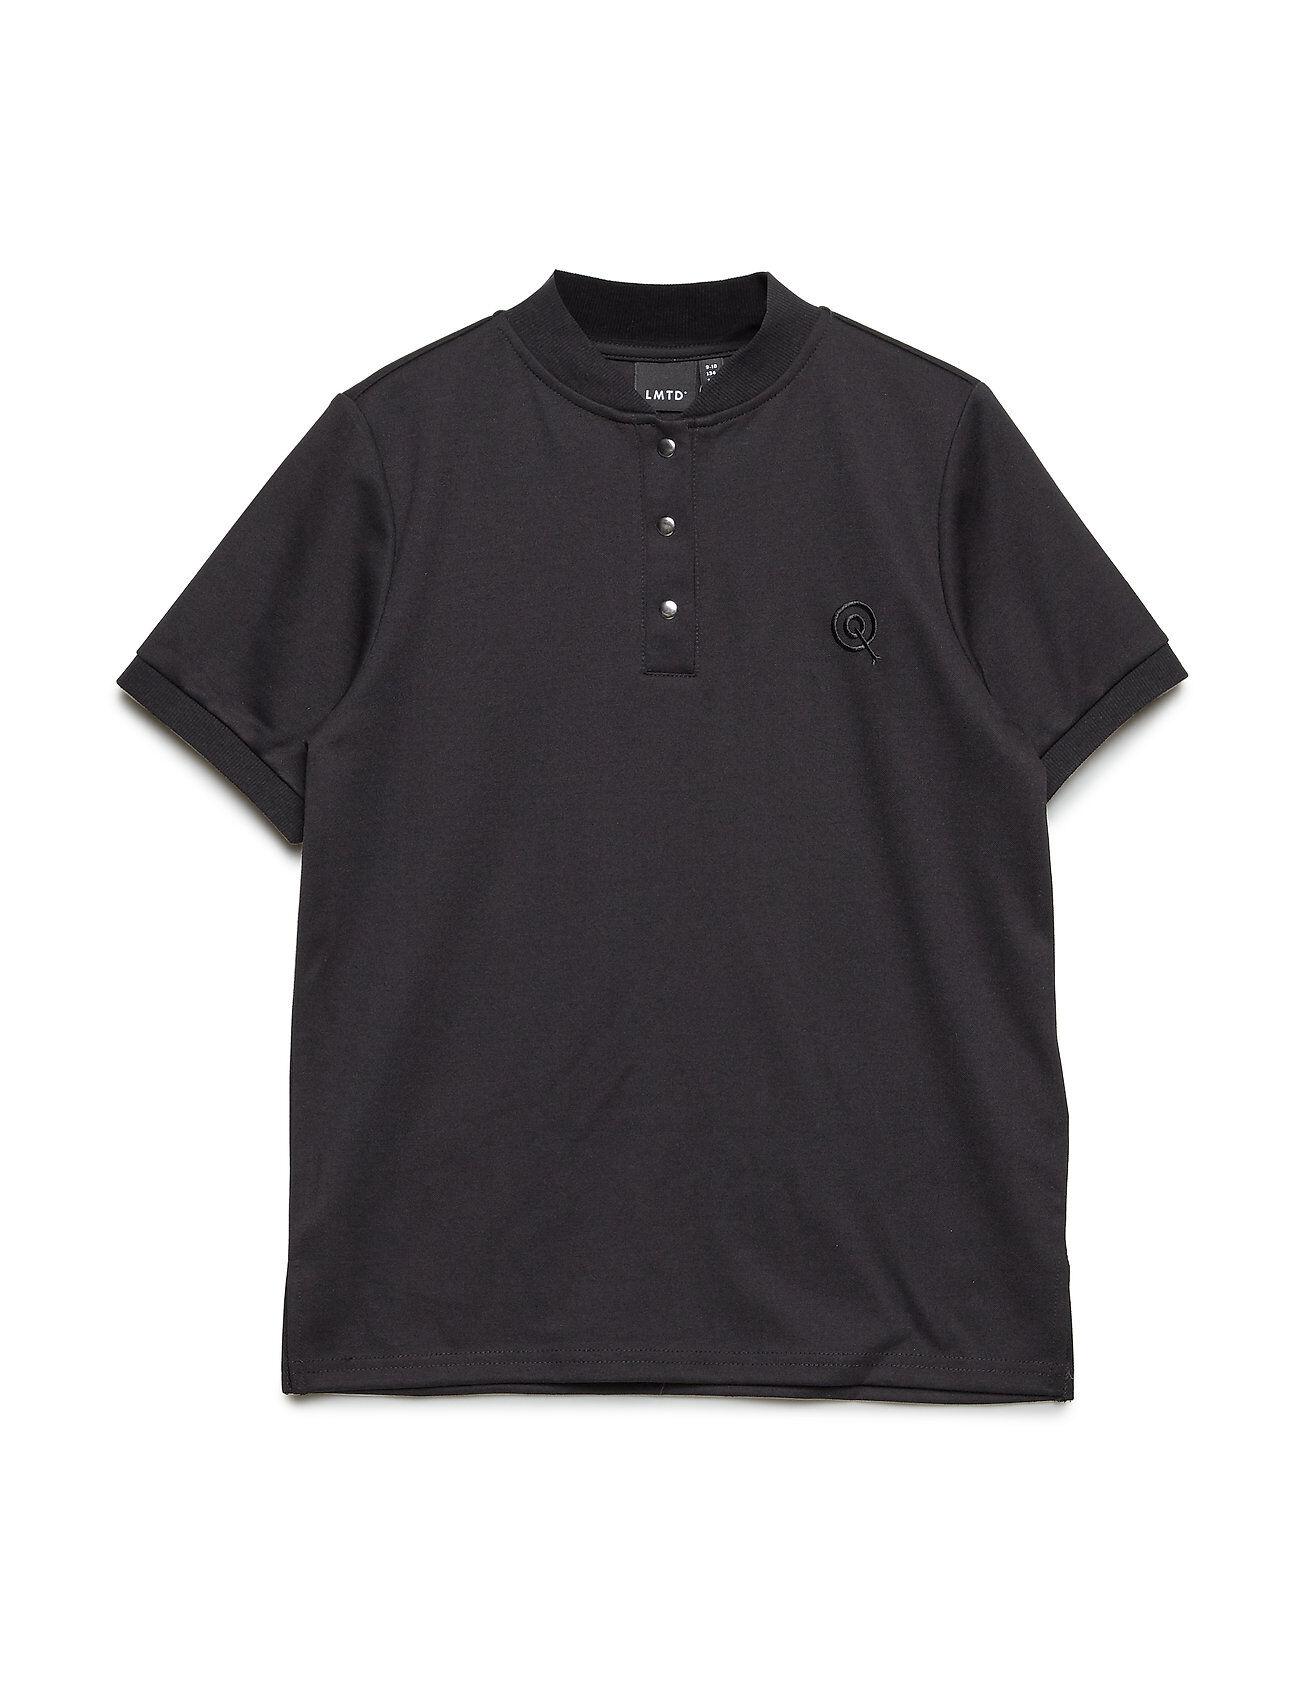 LMTD Nlmbolo Ss Reg Polo T-shirts Short-sleeved Musta LMTD